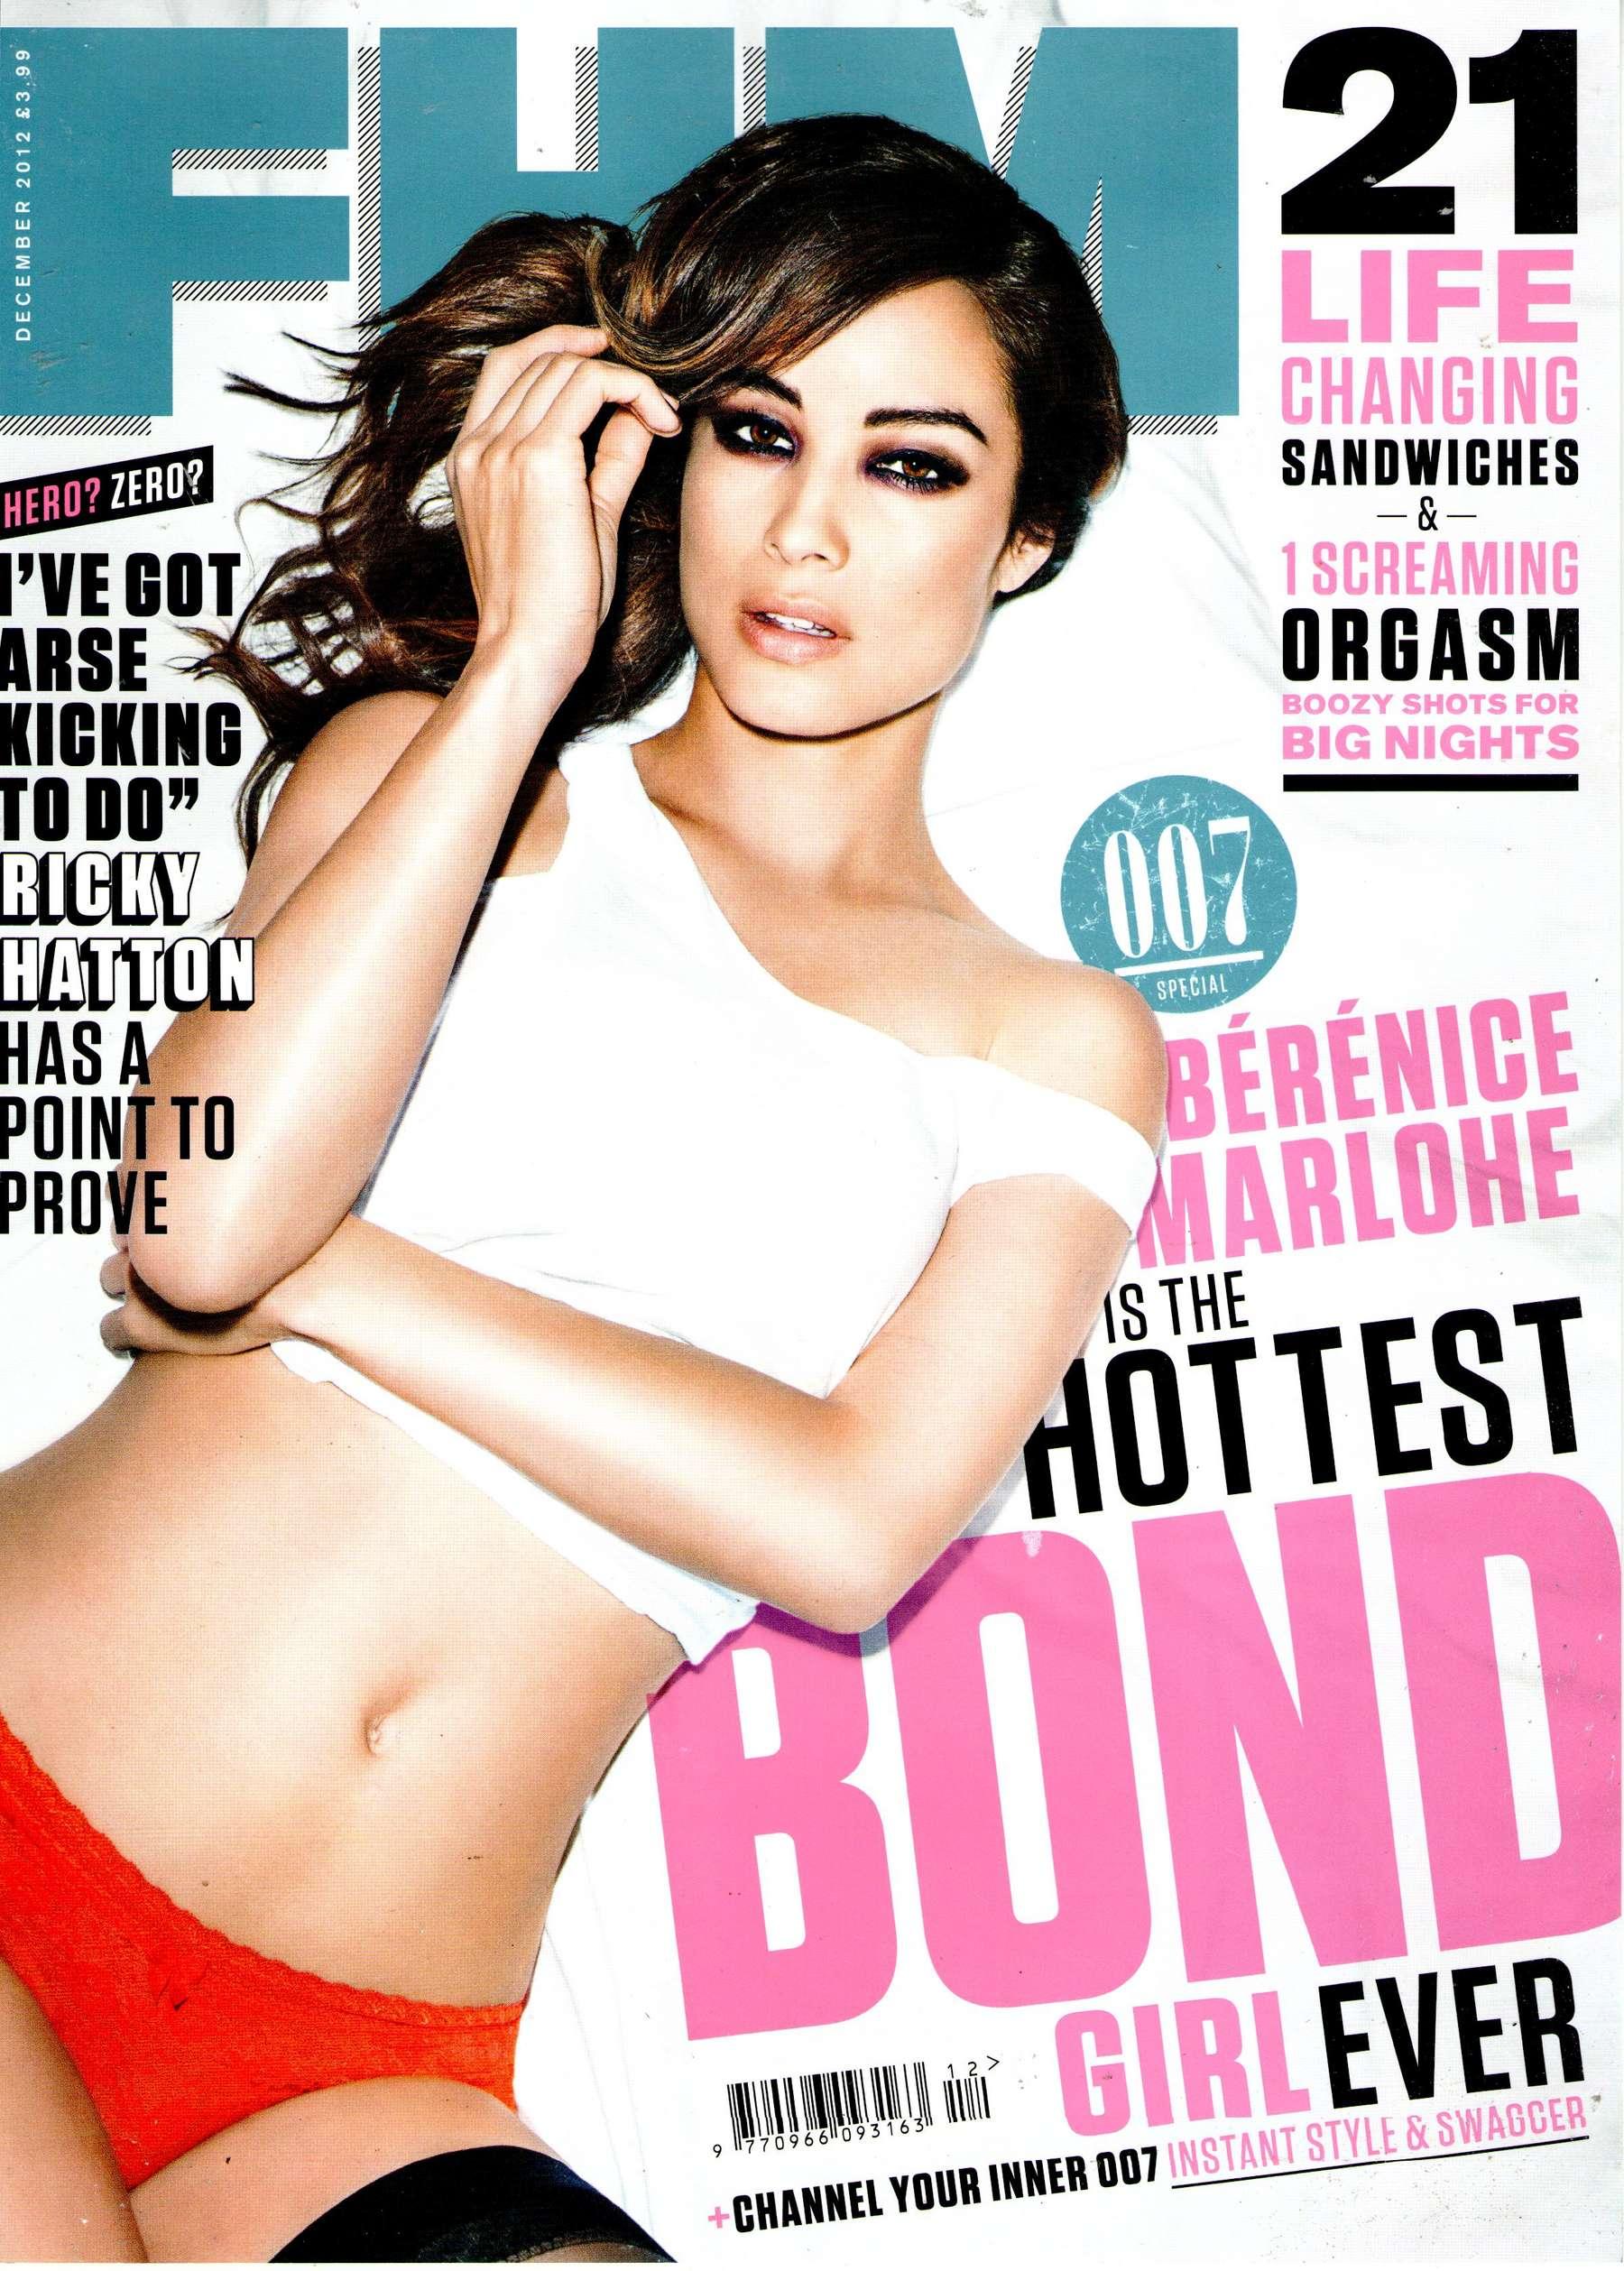 Berenice Marlohe - Hot Bond Girl - FHM Magazine-08 - GotCeleb